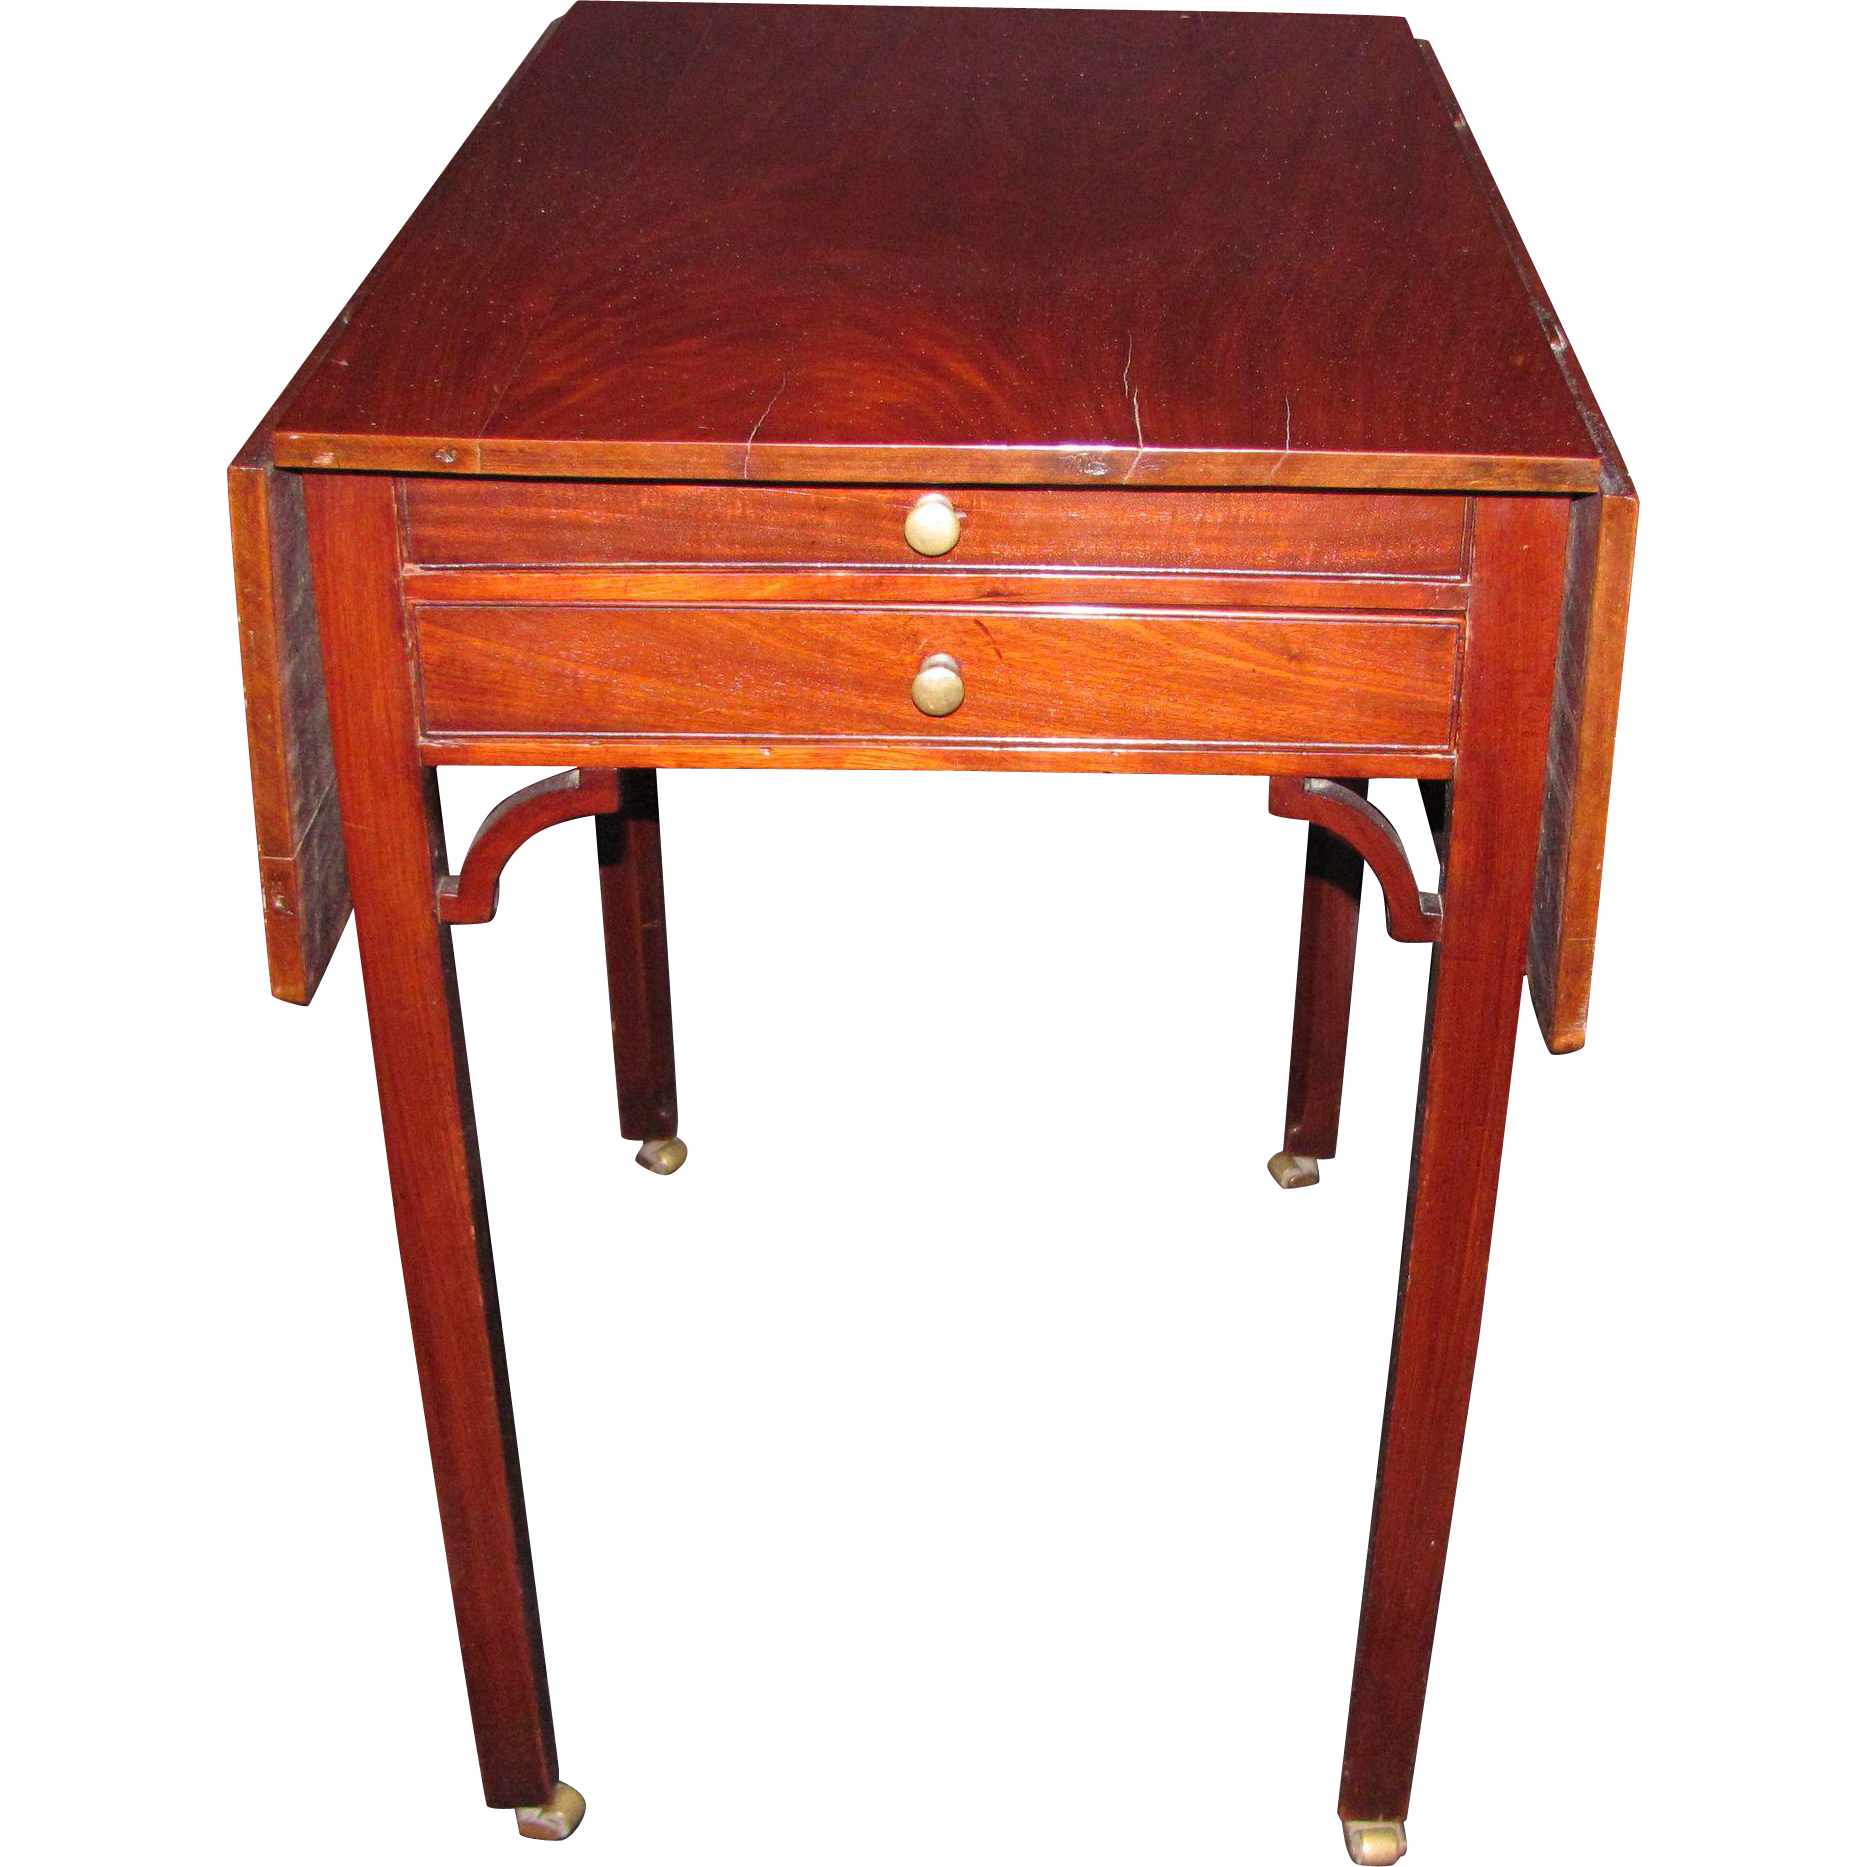 Antique English Chippendale Mahogany Pembroke Table Circa 1770